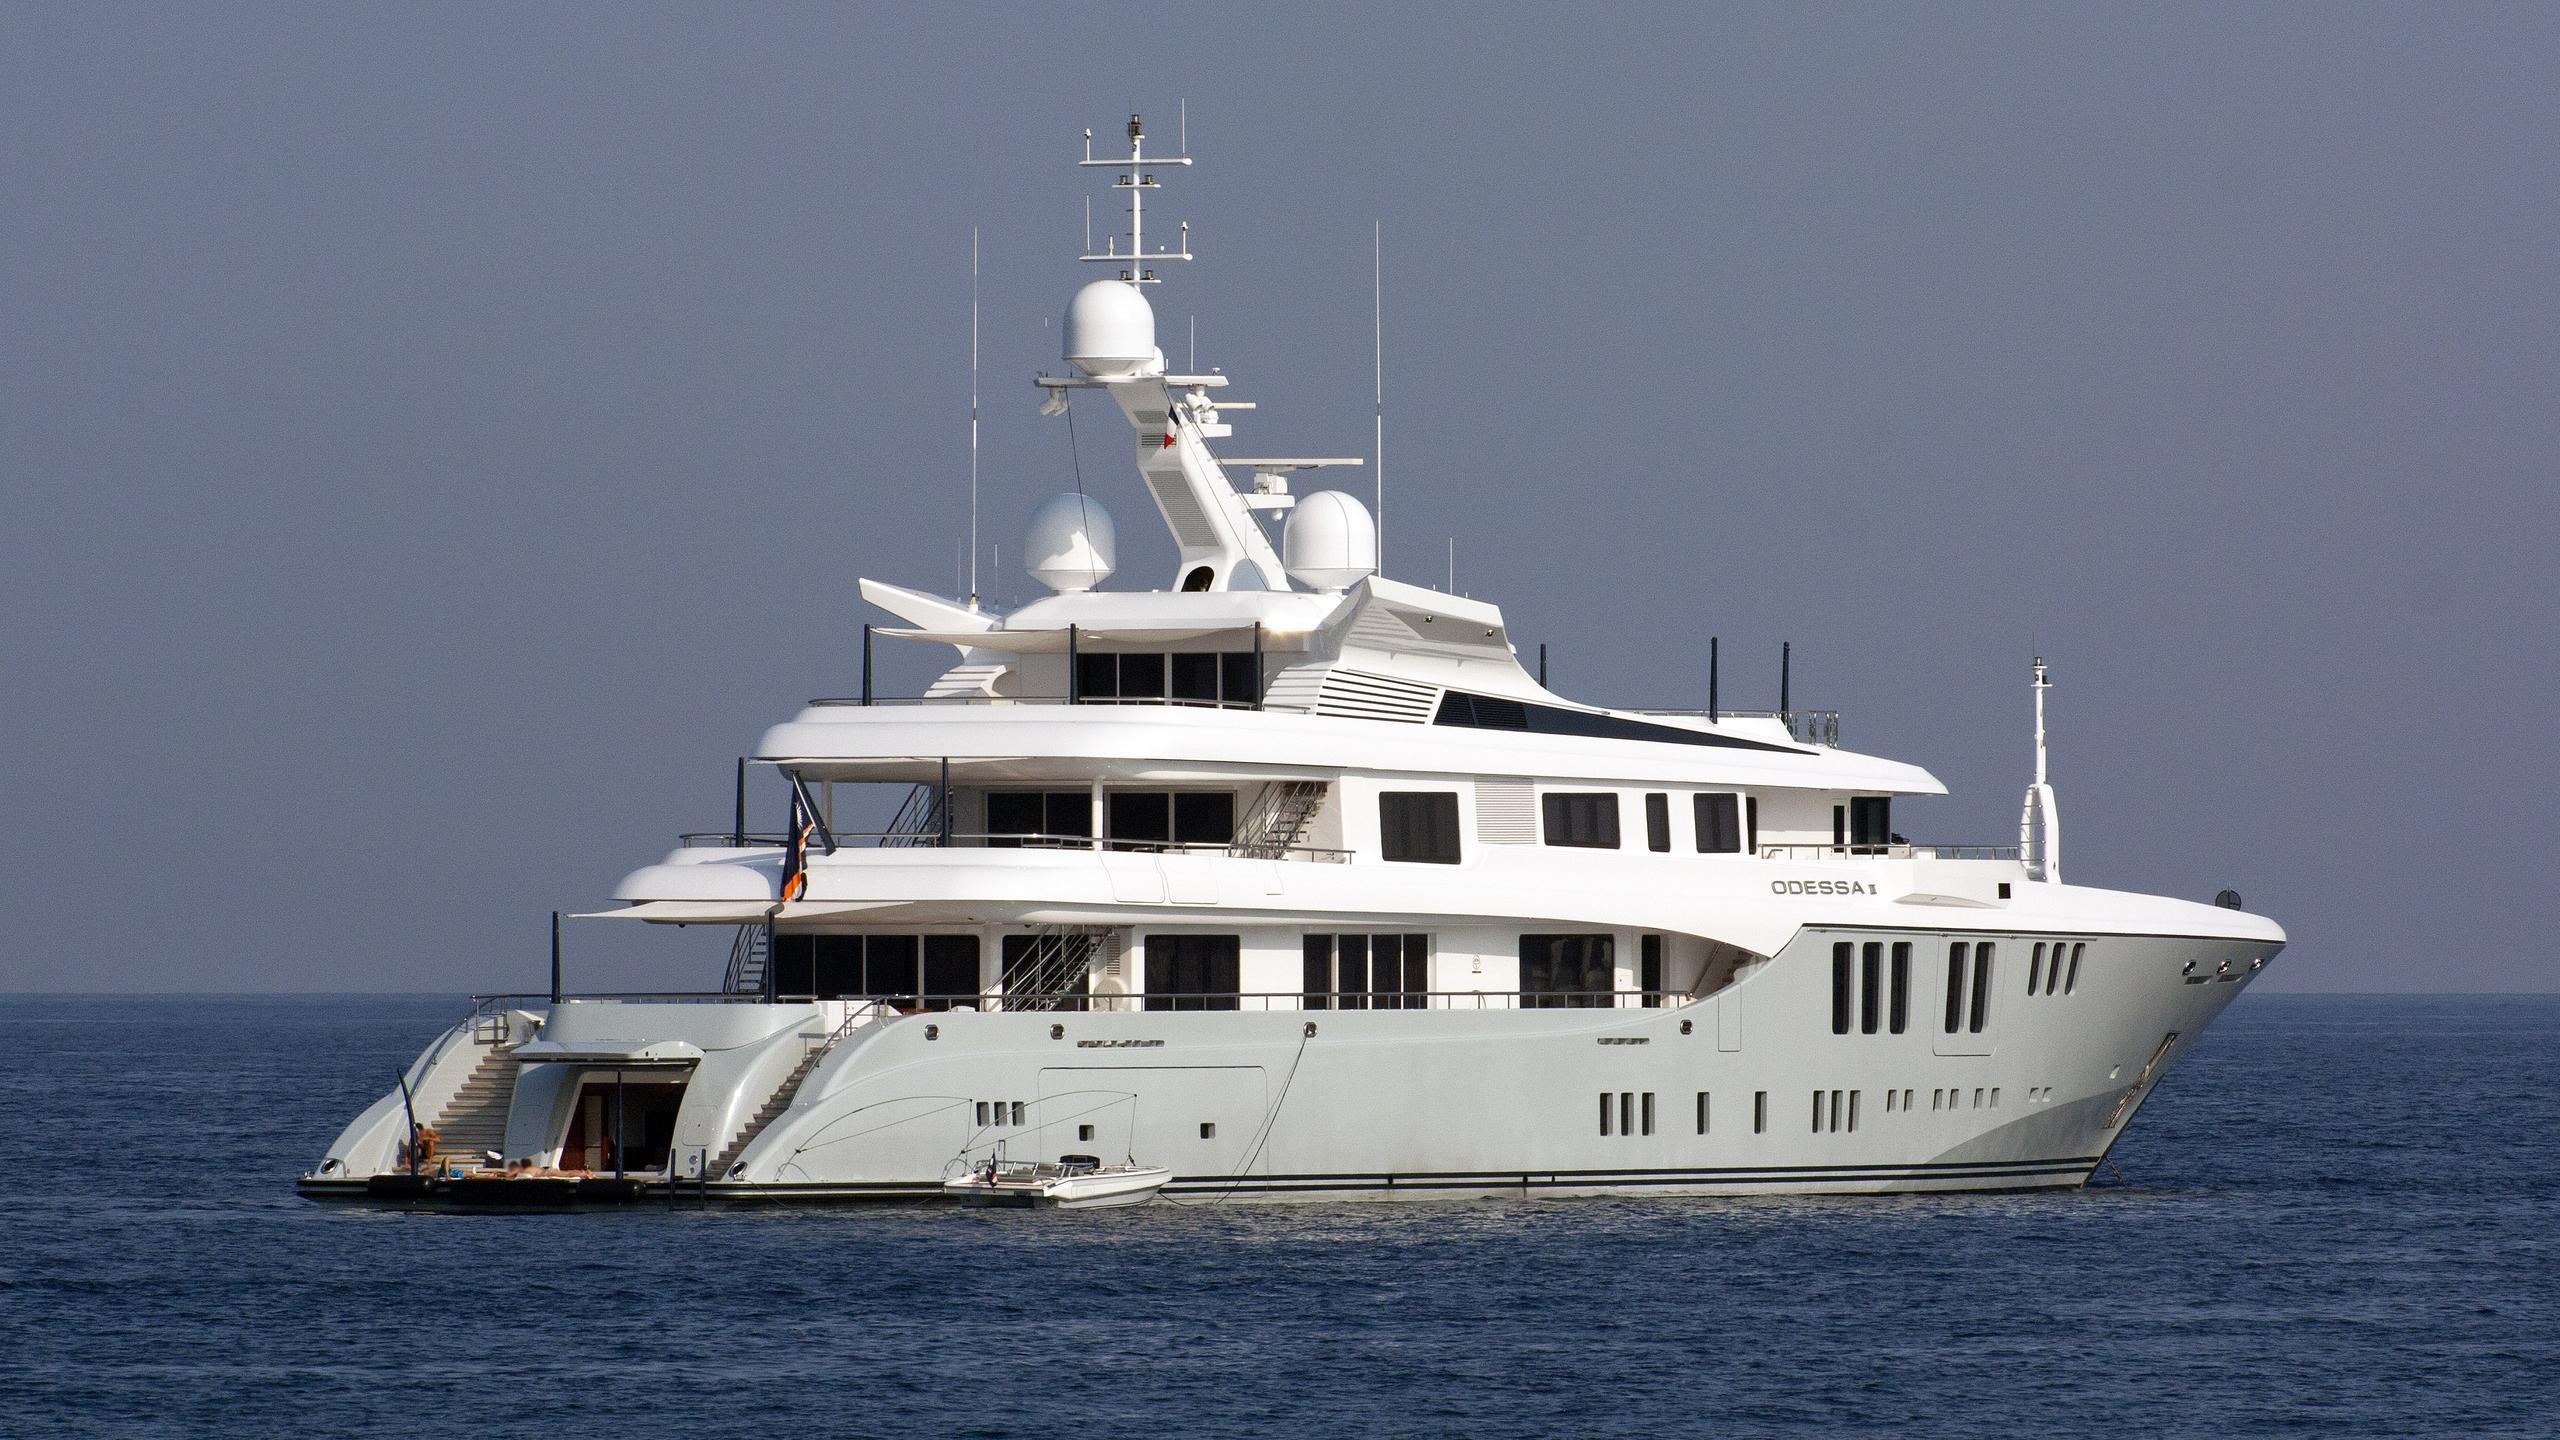 odessa-ii-motor-yacht-nobiskrug-2013-73m-half-profile